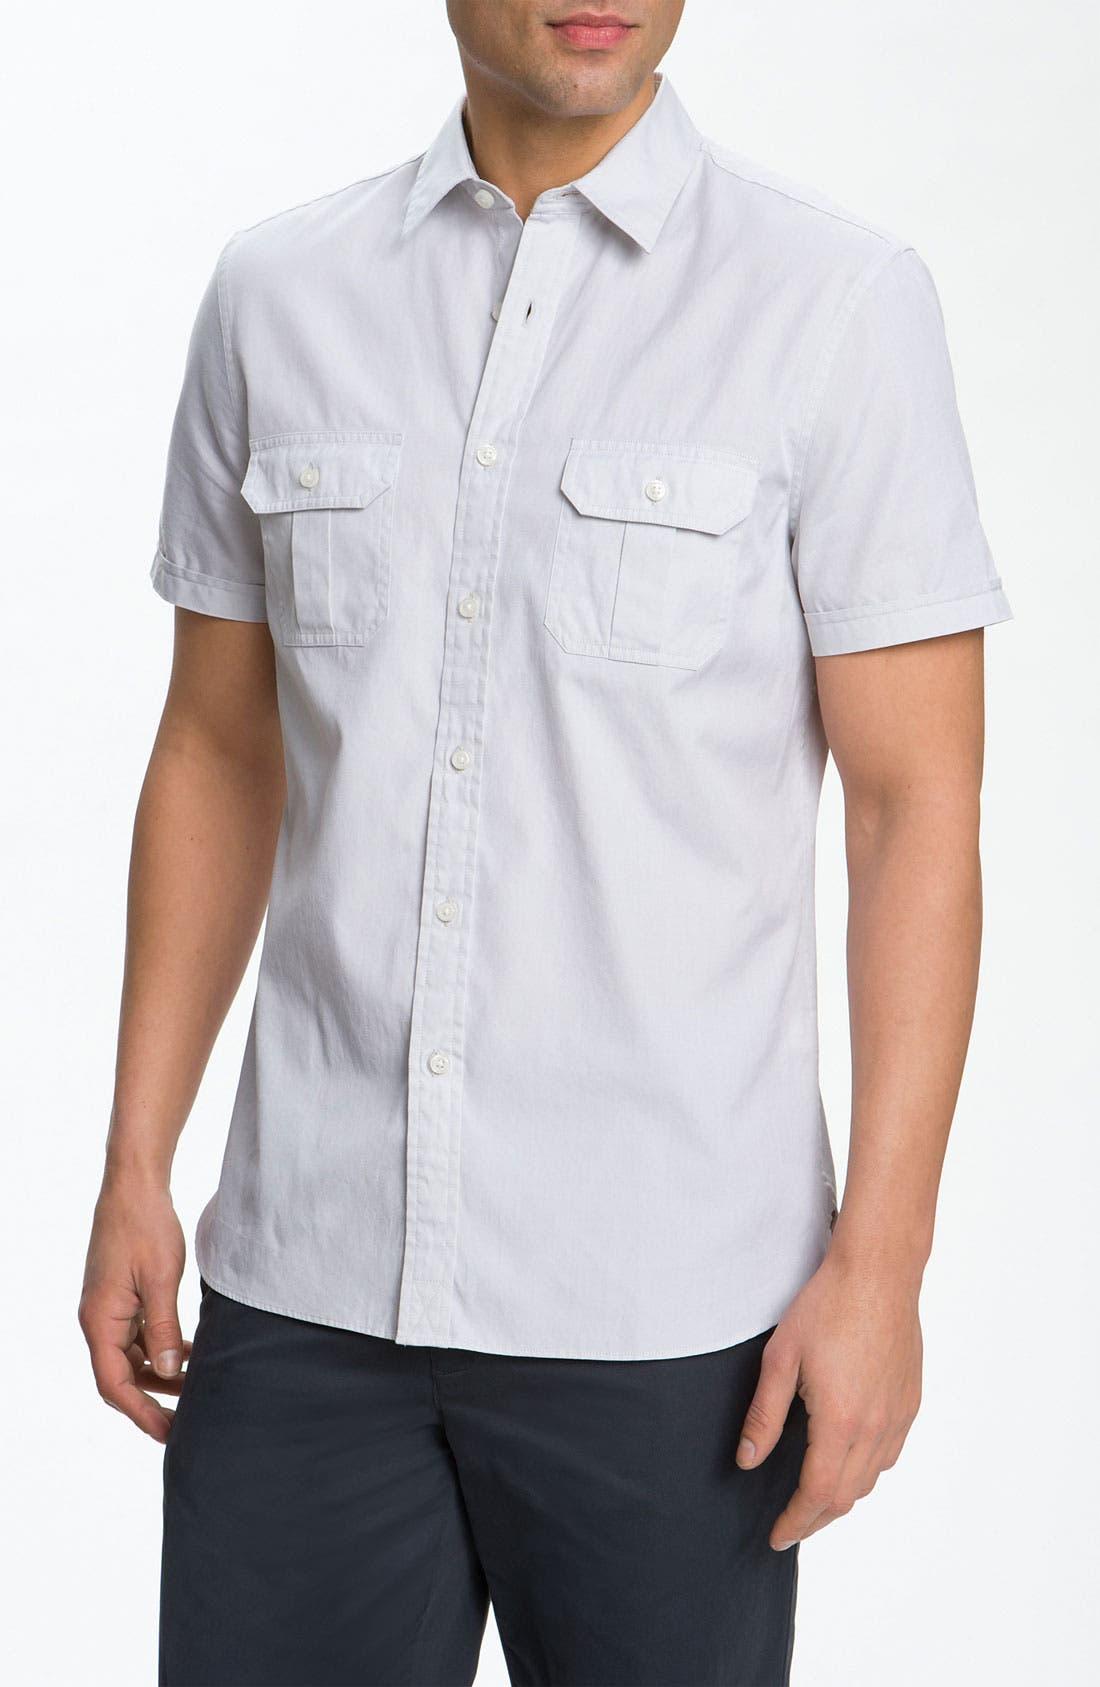 Alternate Image 1 Selected - Wallin & Bros. 'Richmond' Sport Shirt